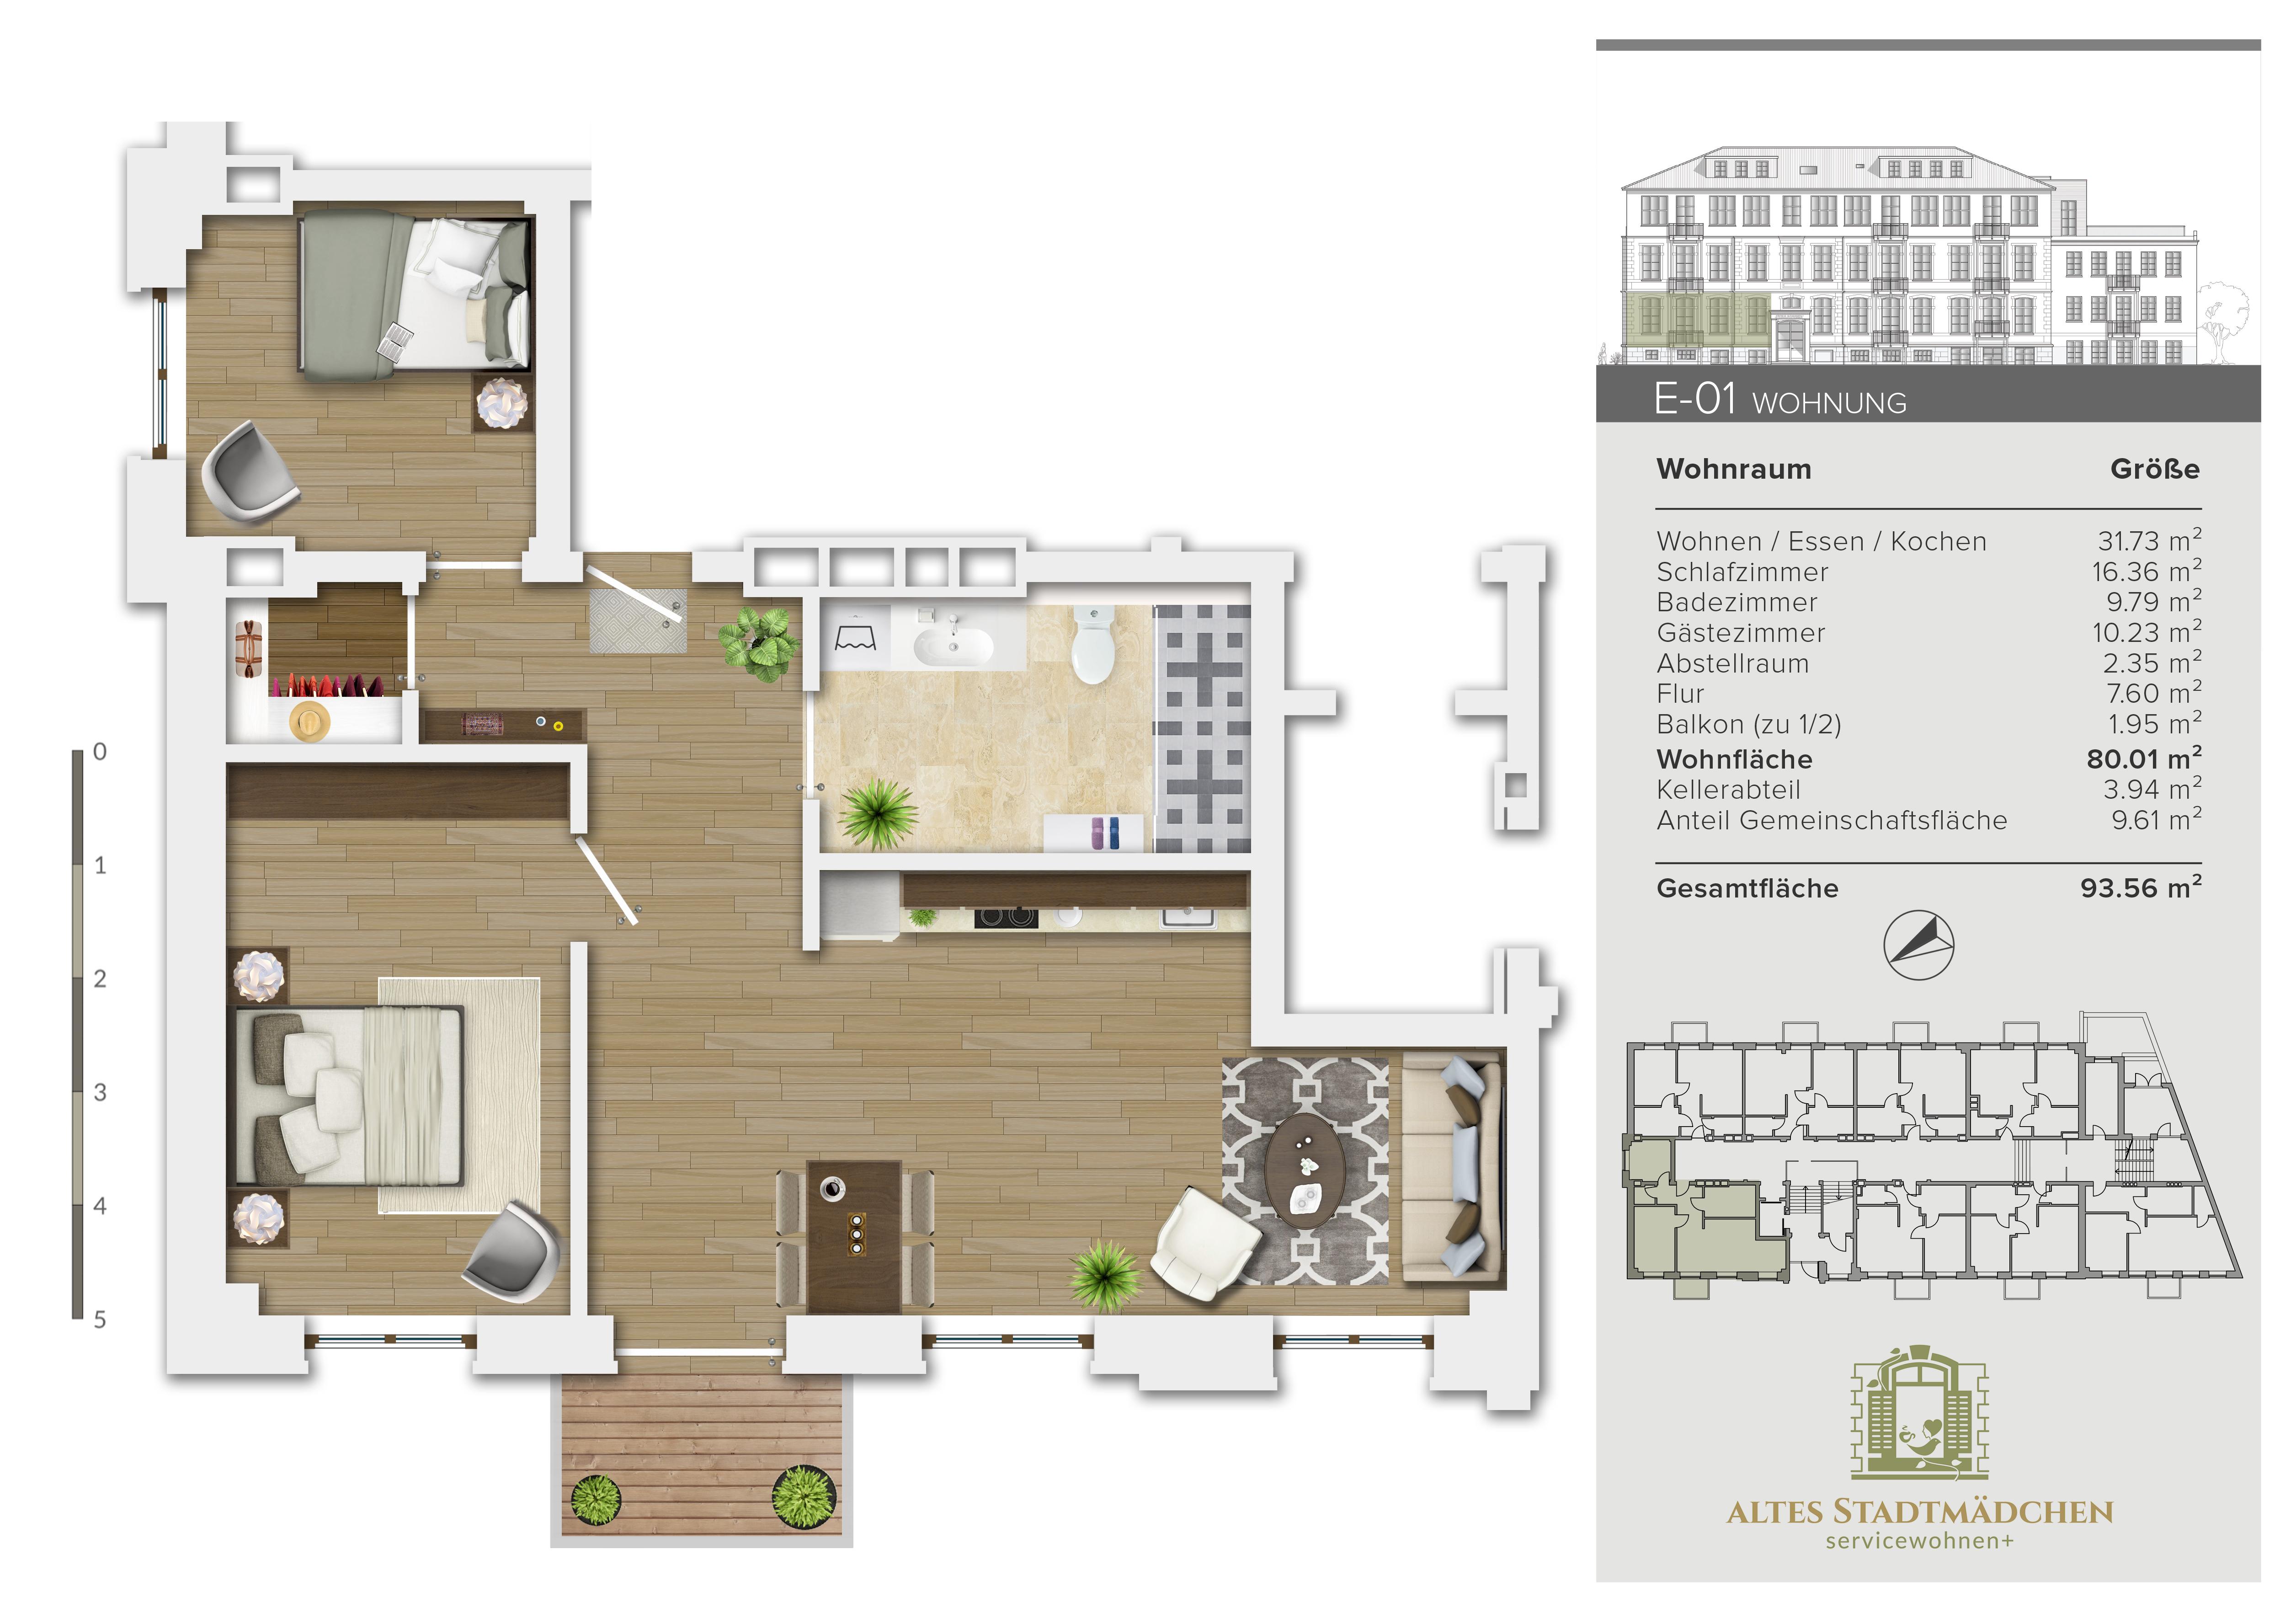 Wohnung E-01